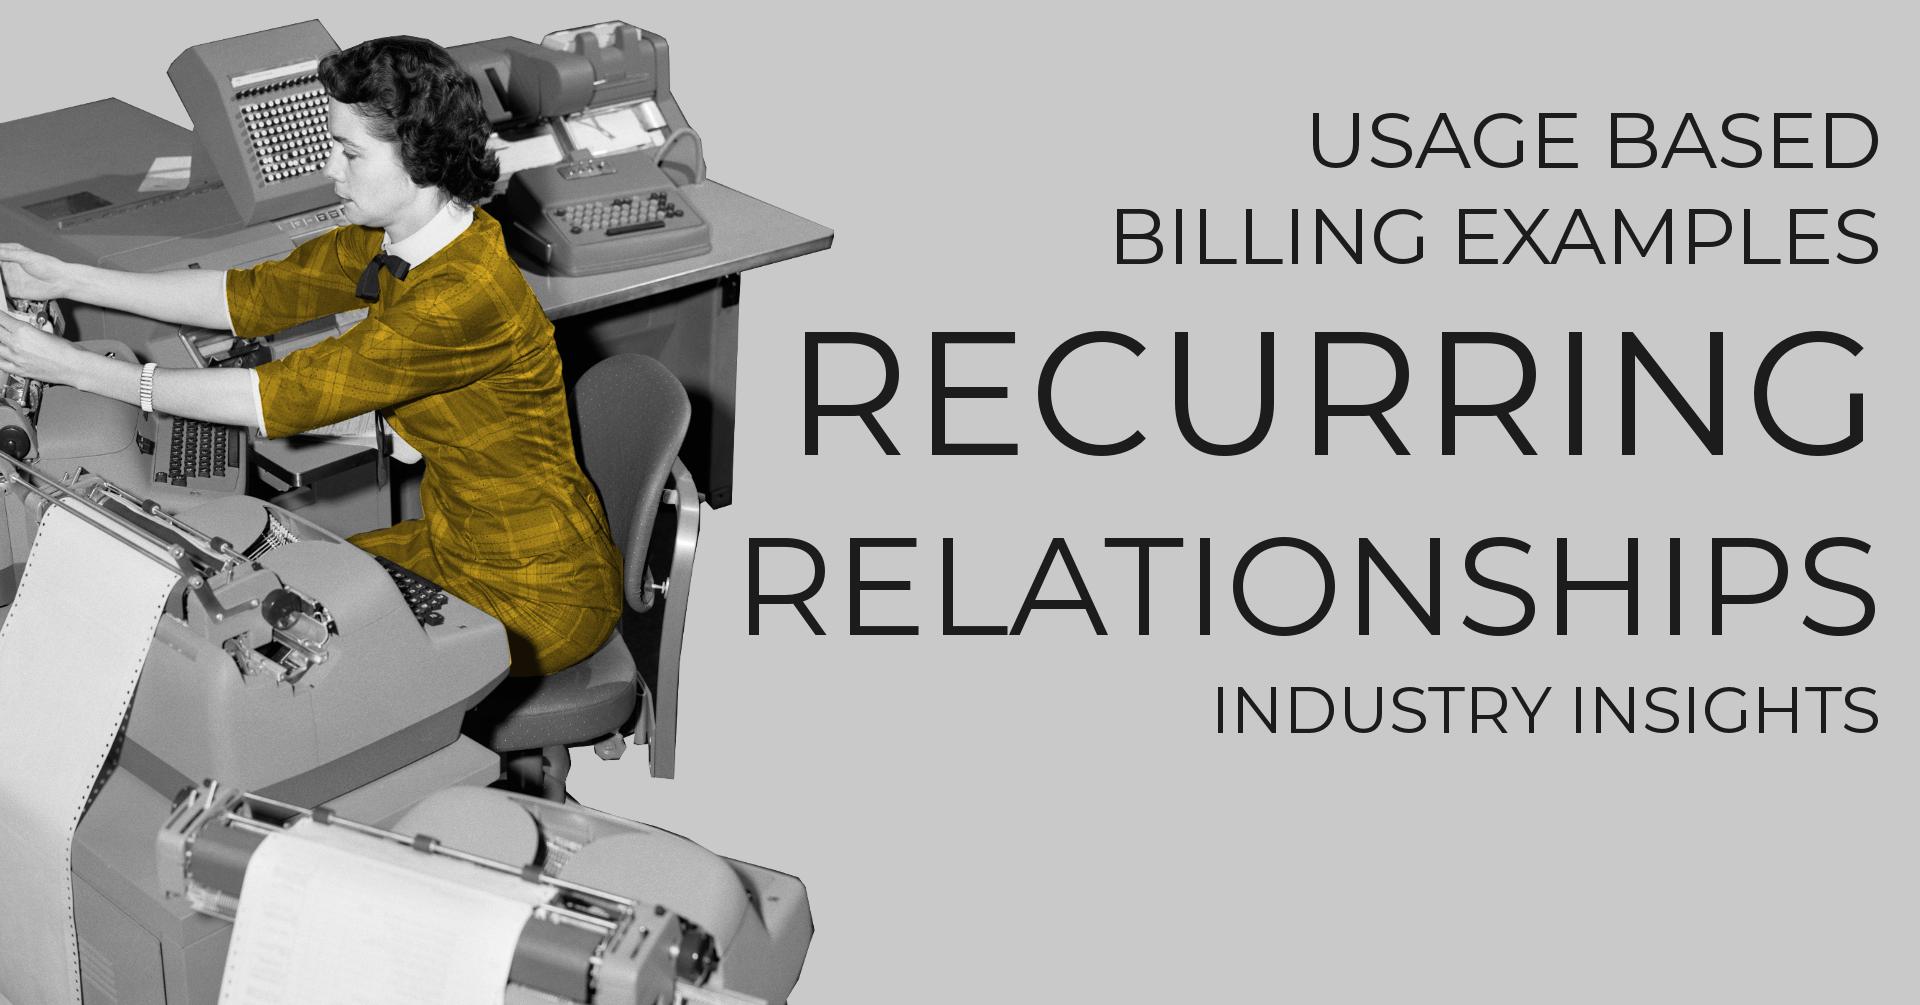 Usage Based Billing Examples that Enhance Recurring Relationships